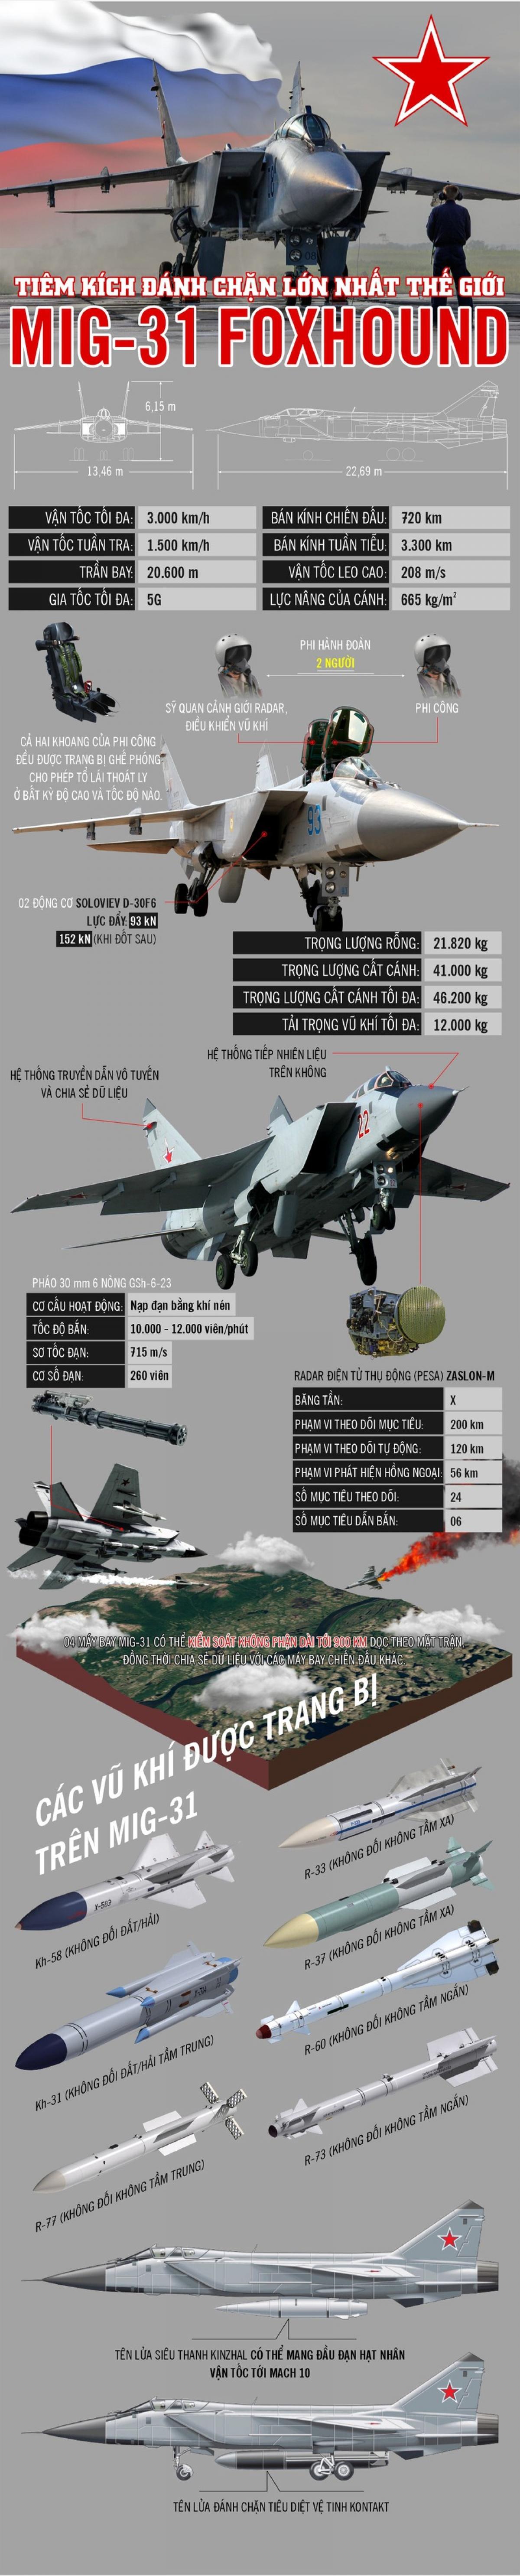 infographic_mig_31.jpg